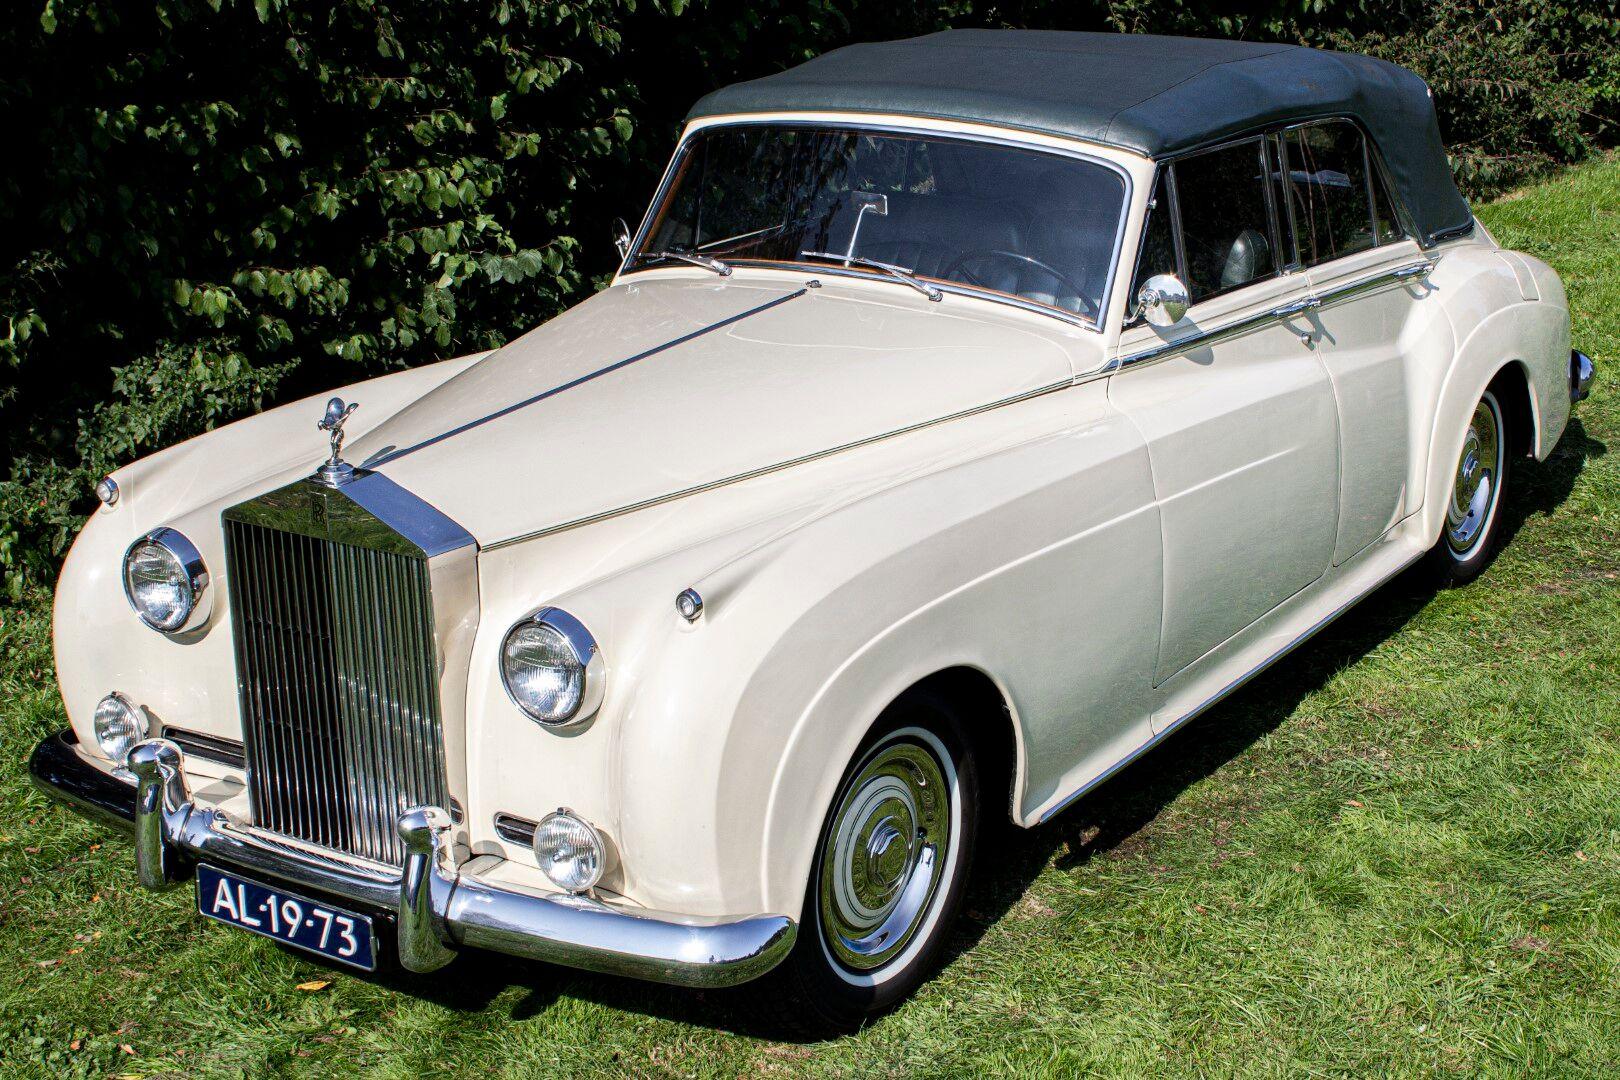 Rolls-Royce Silver Cloud 2 convertible